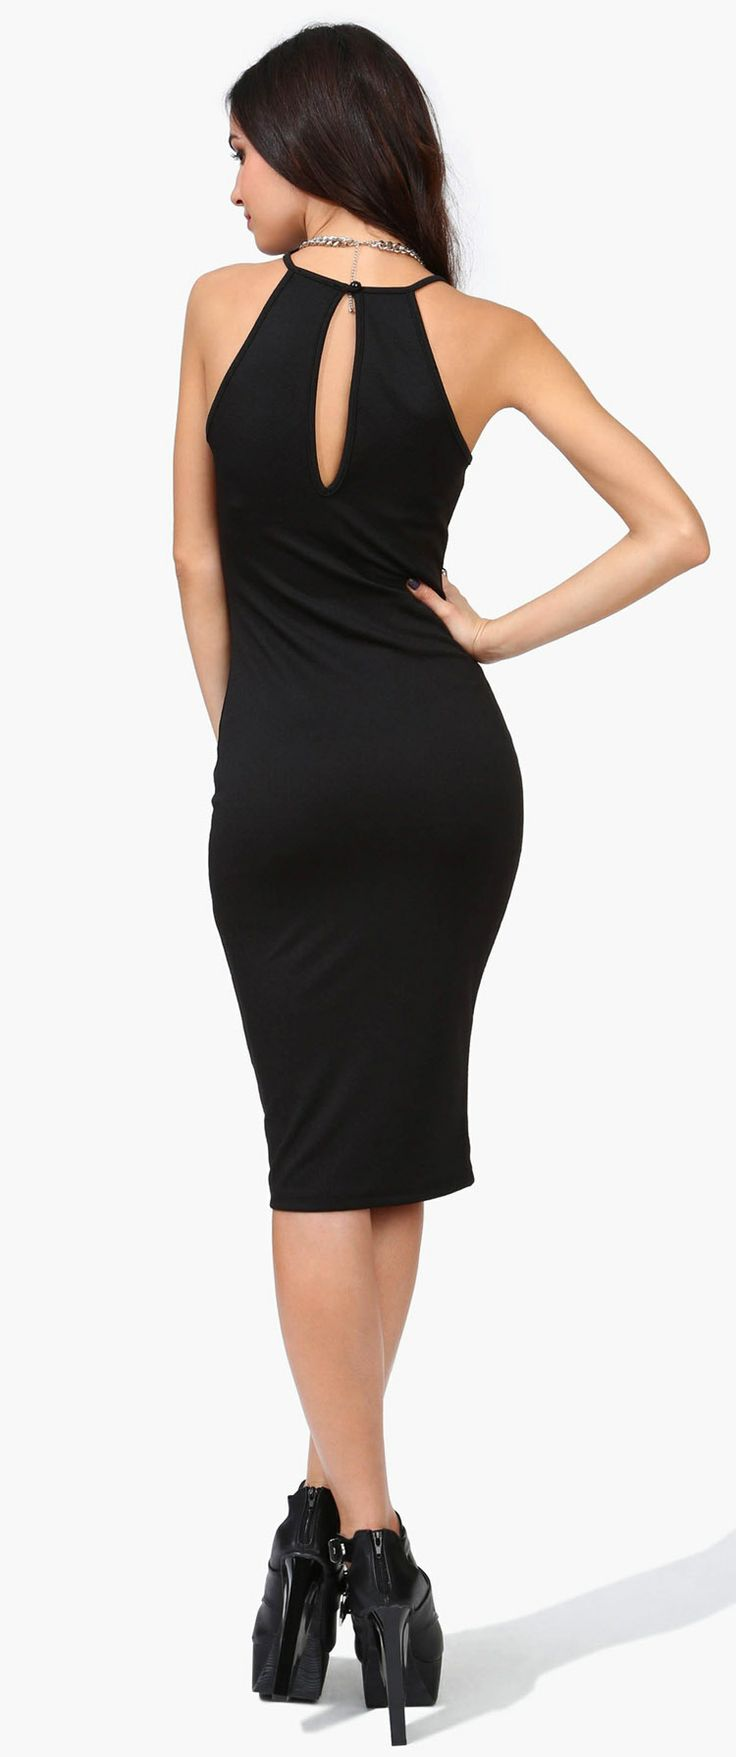 Little Black Dress Singapore